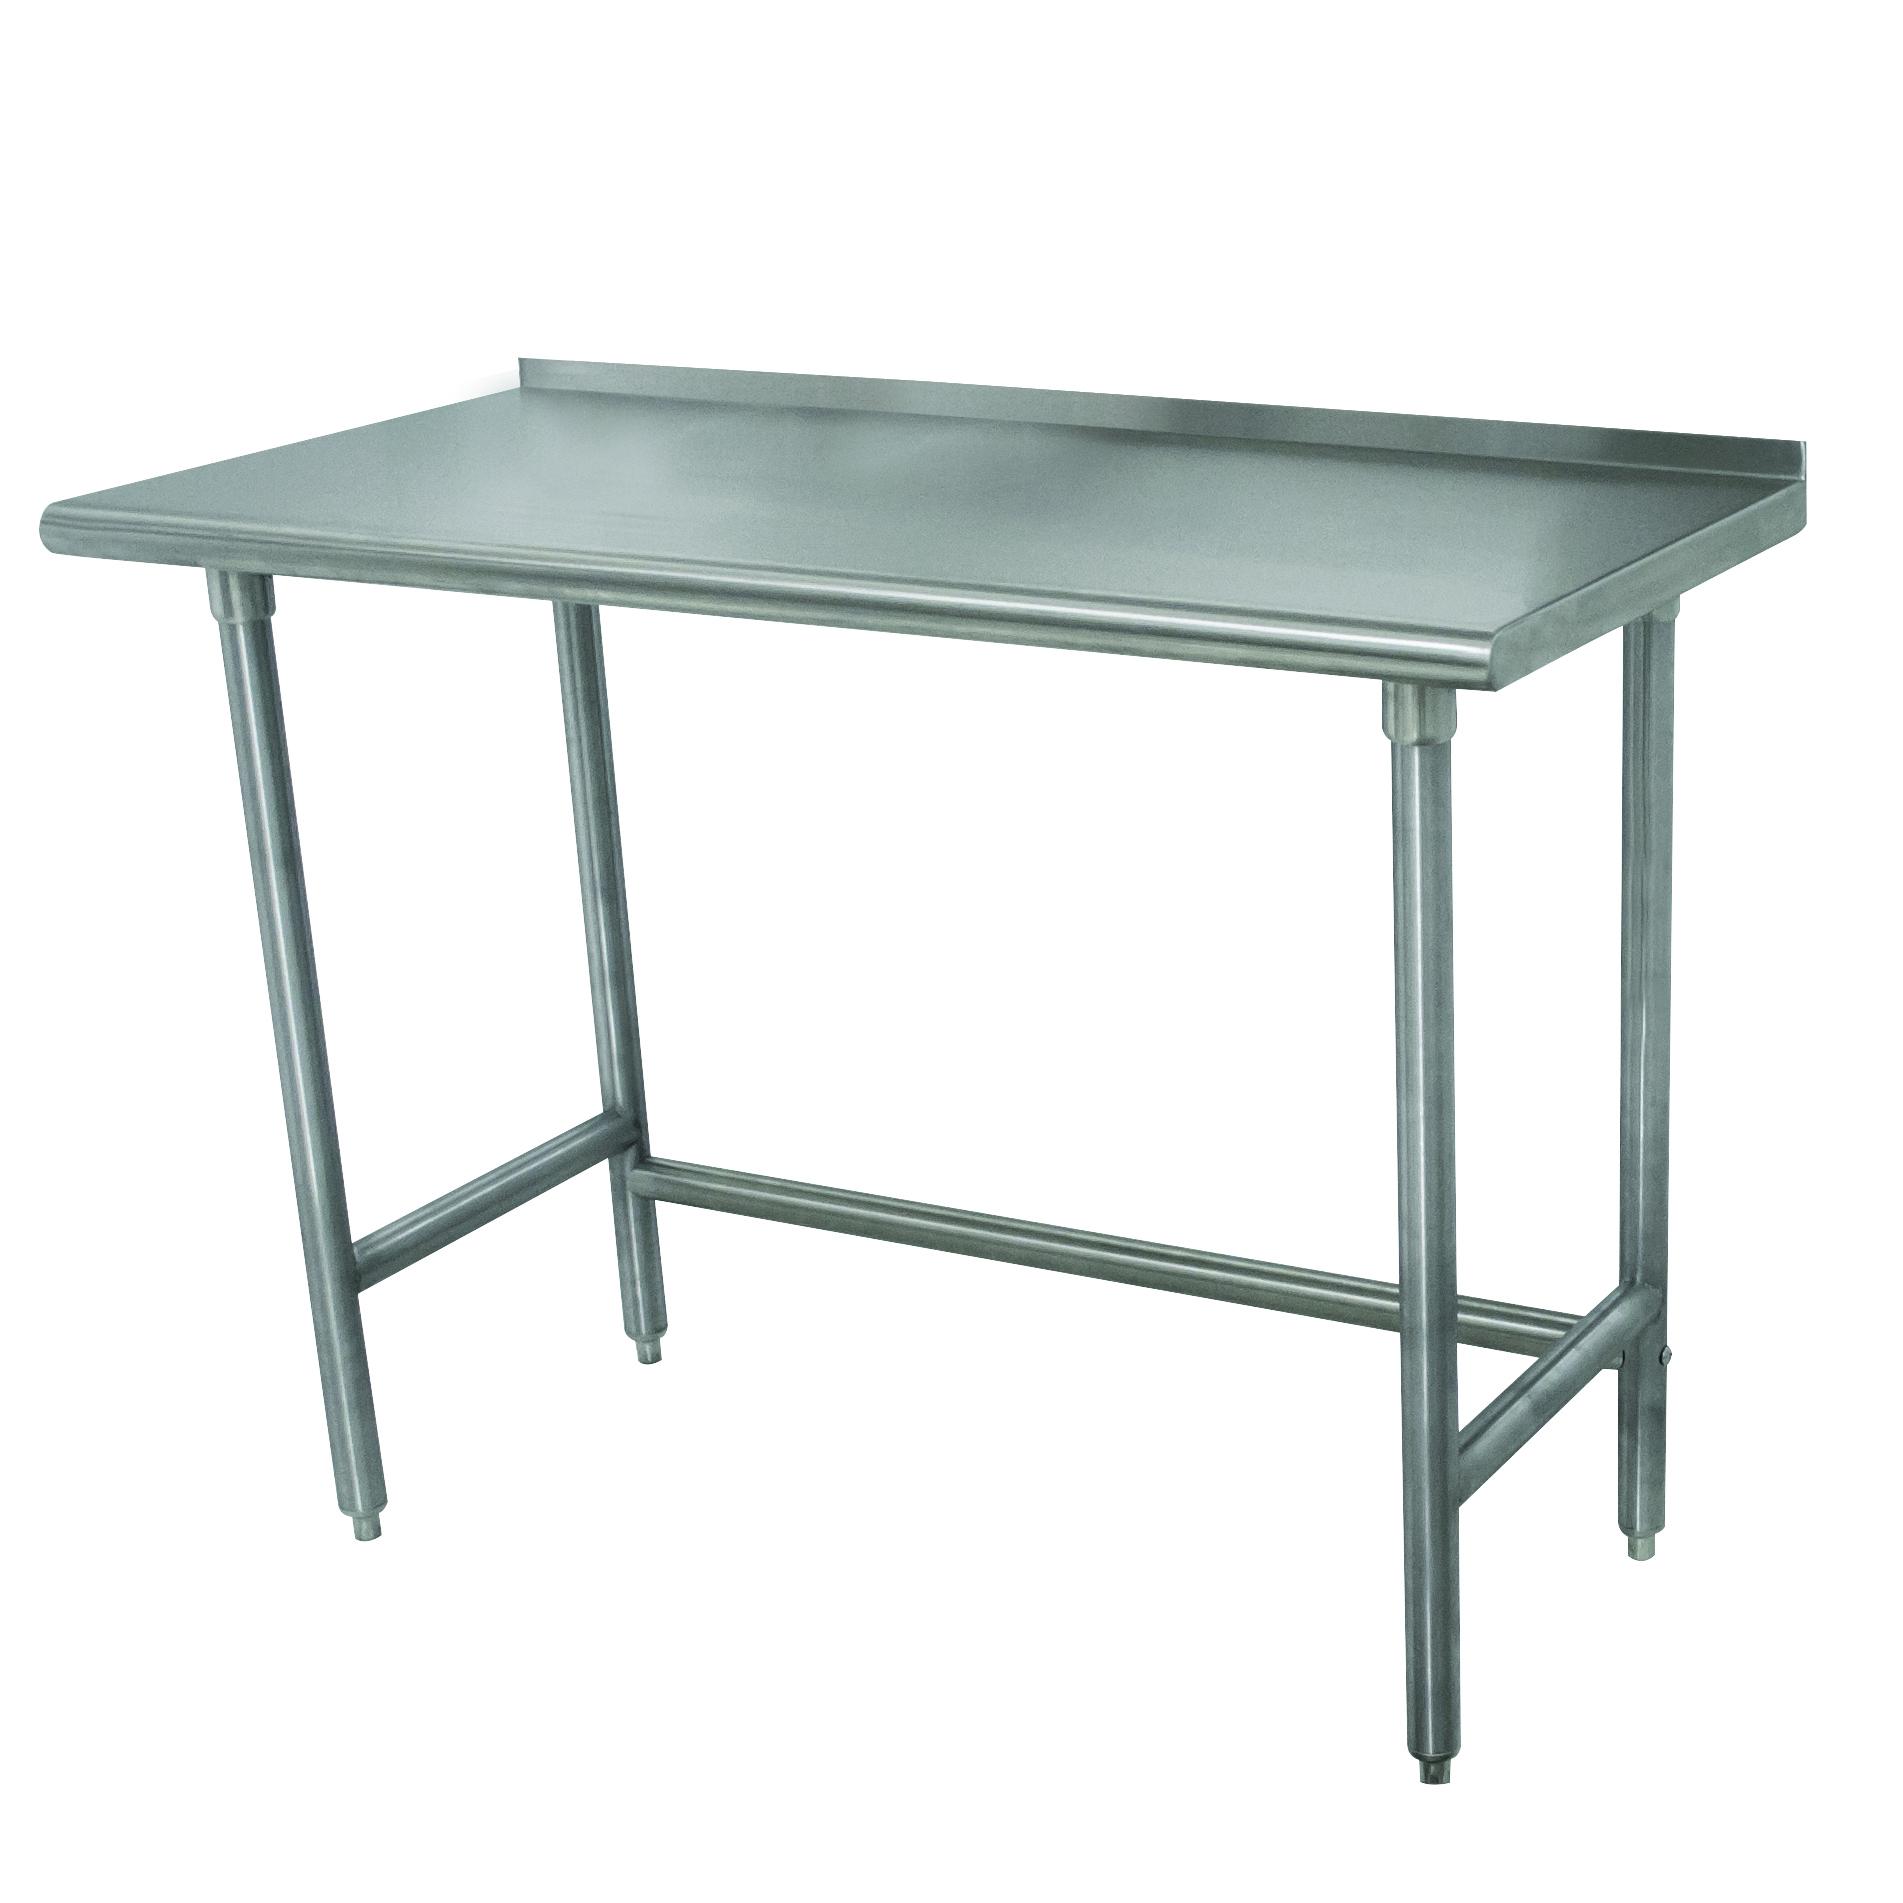 Advance Tabco TFLAG-305-X work table,  54